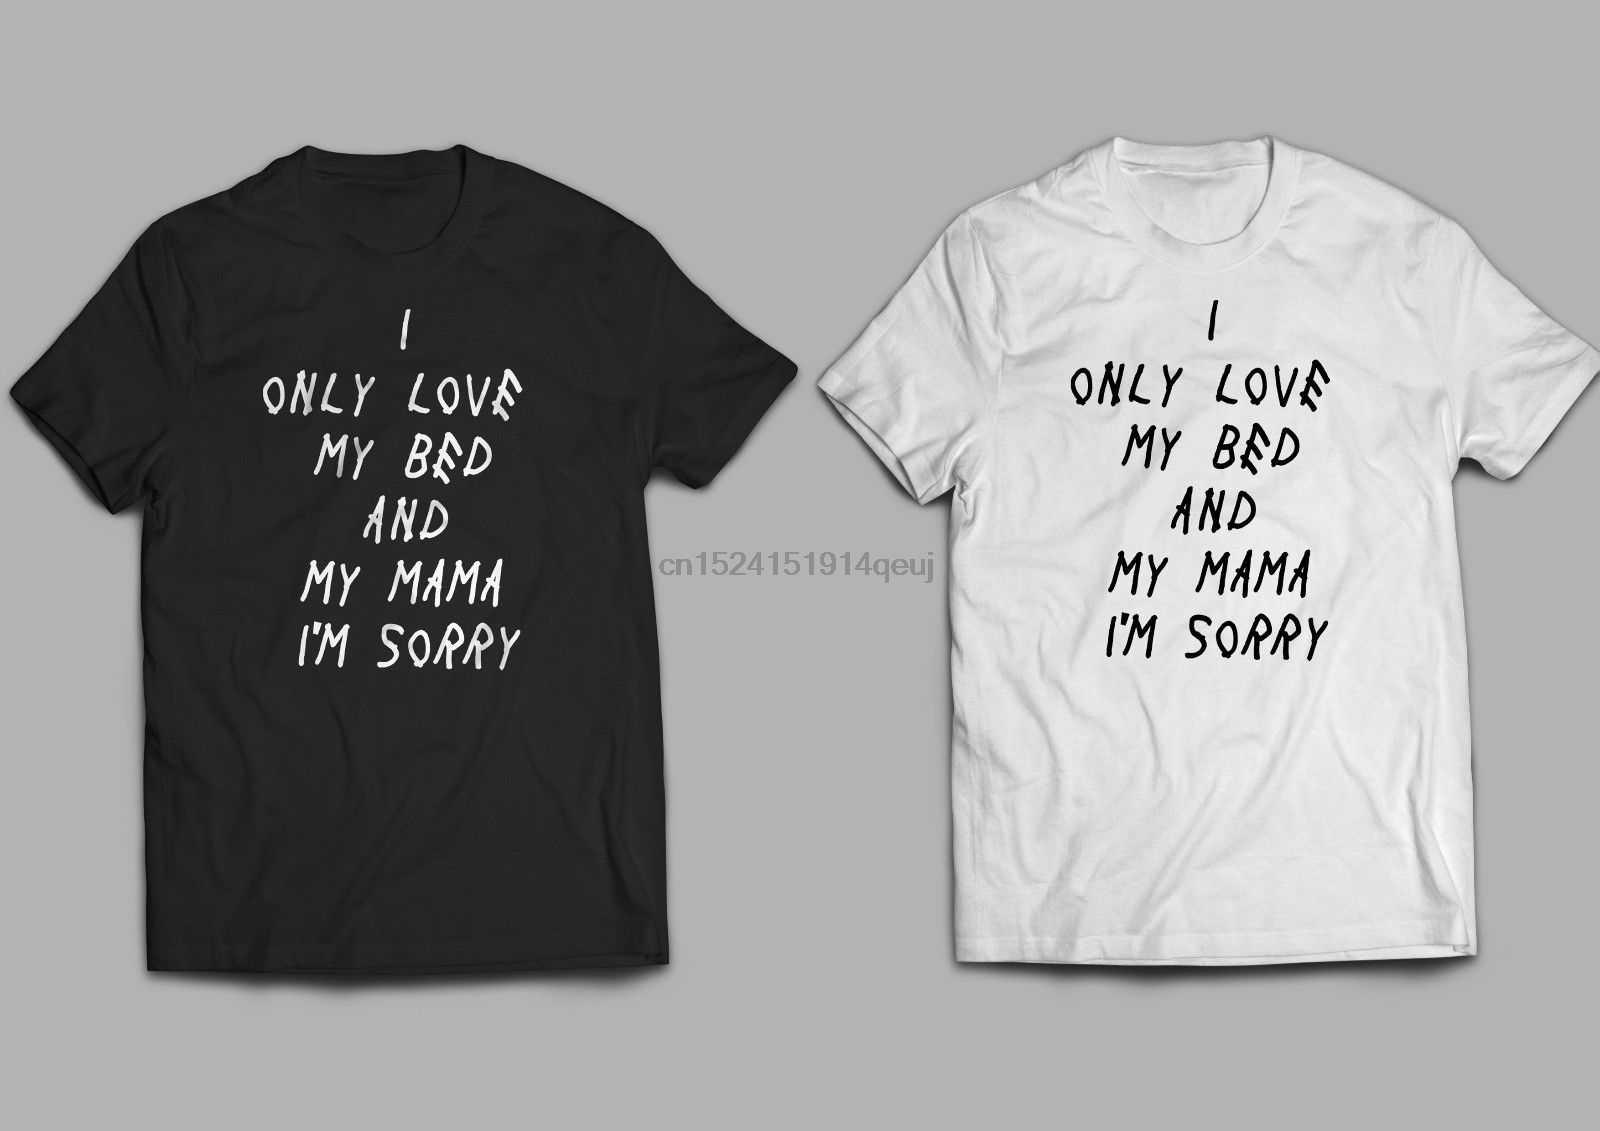 Drake Gods Plan T-shirts or DIY vinyl RAPPER HIP HOP TUMBLR SAD RIP RAP 06597538f562